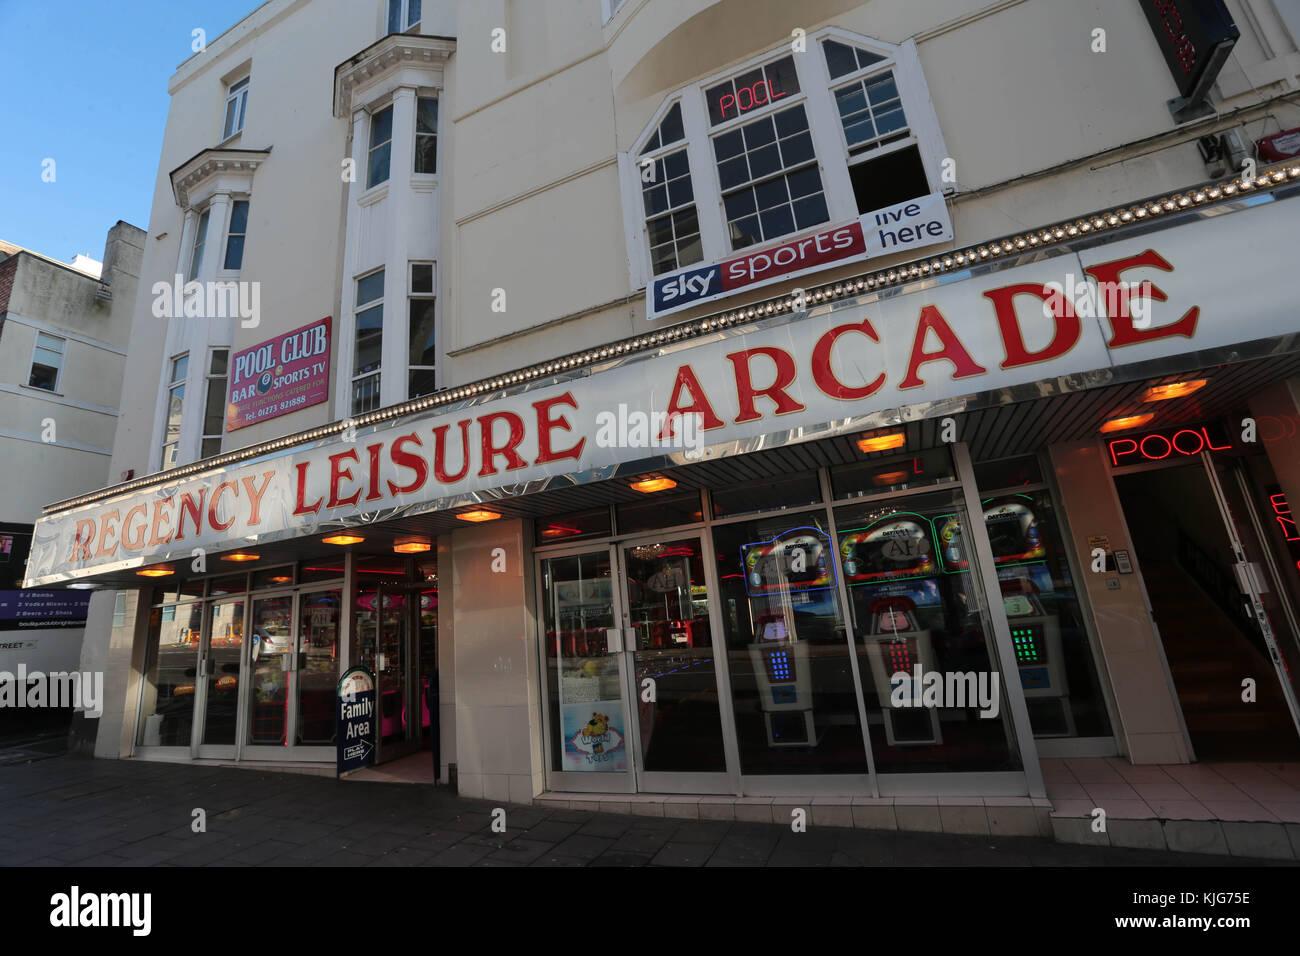 Regency Leisure Arcade West Street Brighton - Stock Image